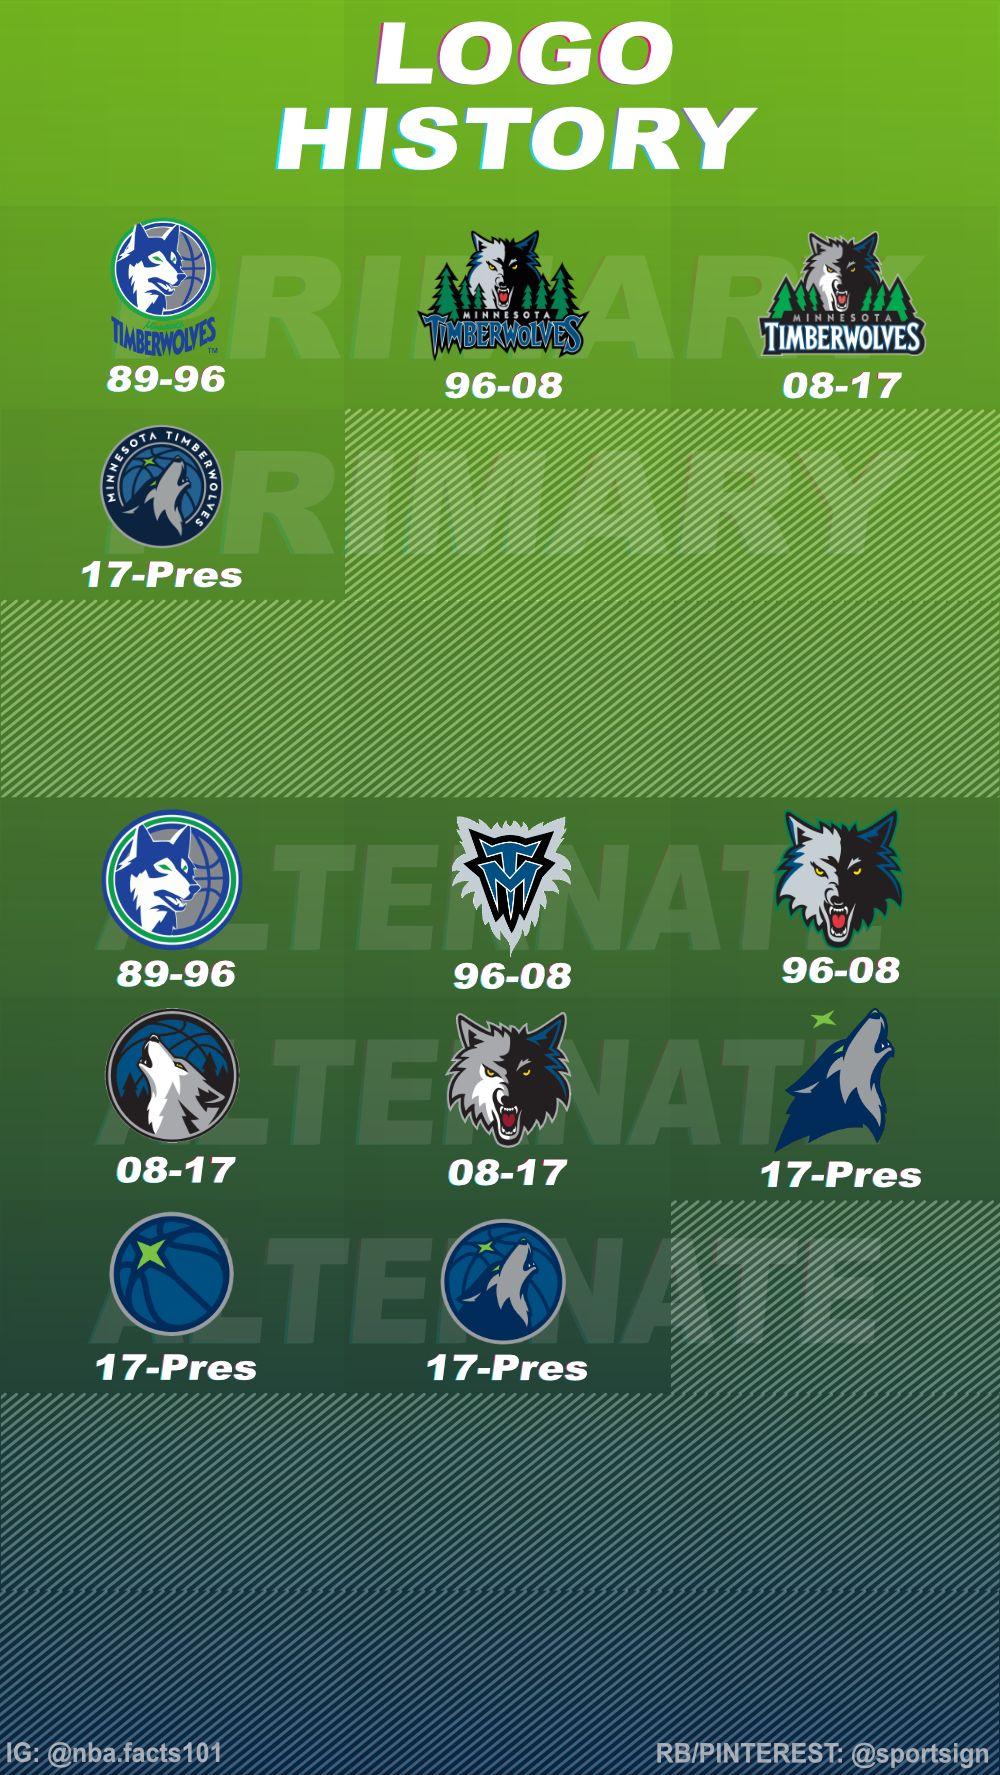 History Of The Nba Basketball Team Minnesota Timberwolves Logos